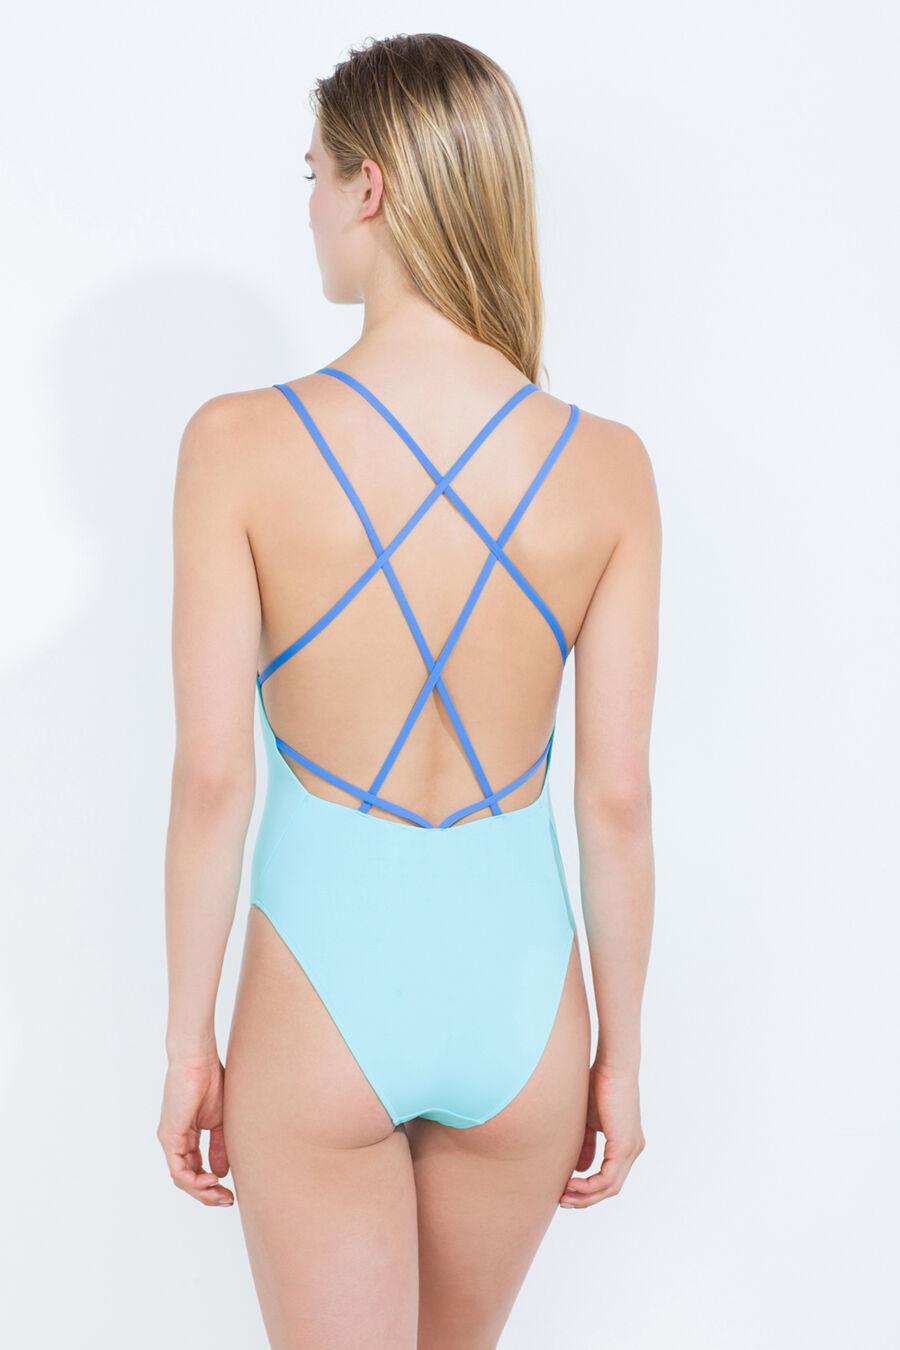 Cris cross strap swimsuit